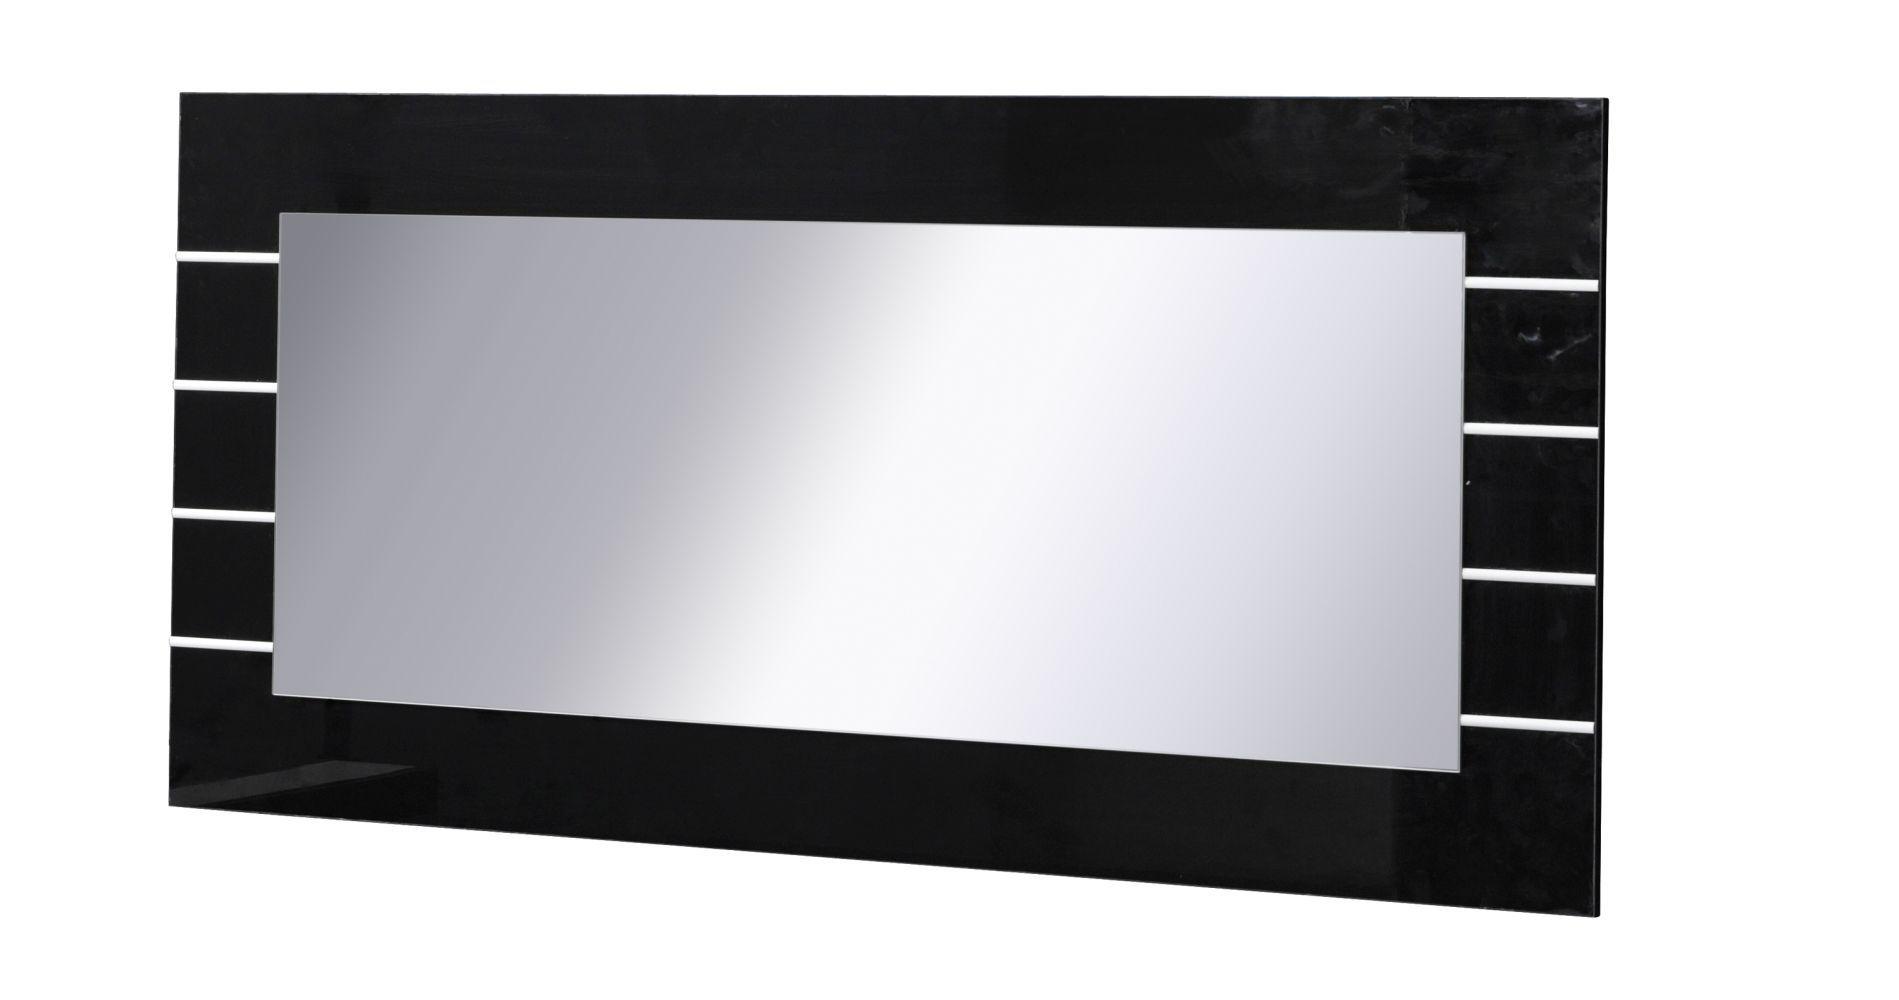 "Spiegel ""Livadia"" - Abmessungen: 60 x 120 x 2 cm (H x B x T)"